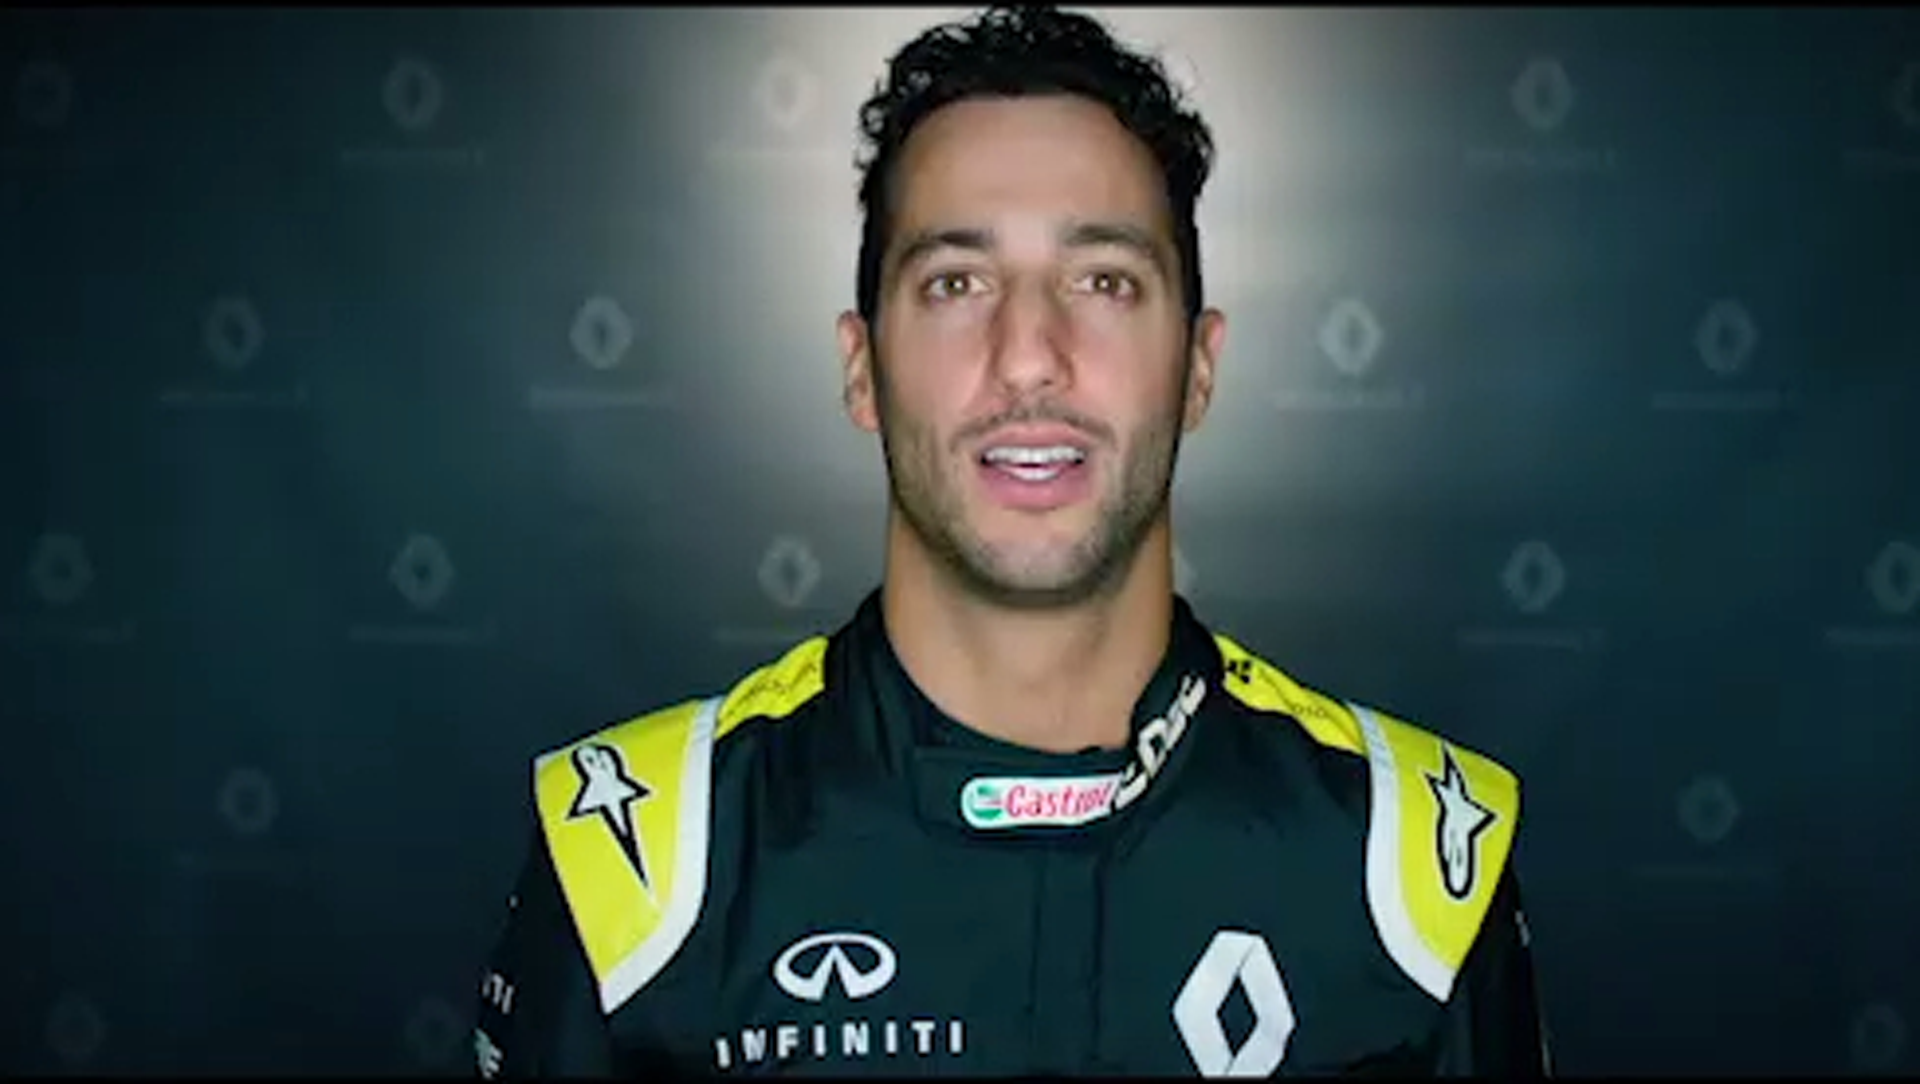 Daniel Ricciardo's biggest move yet